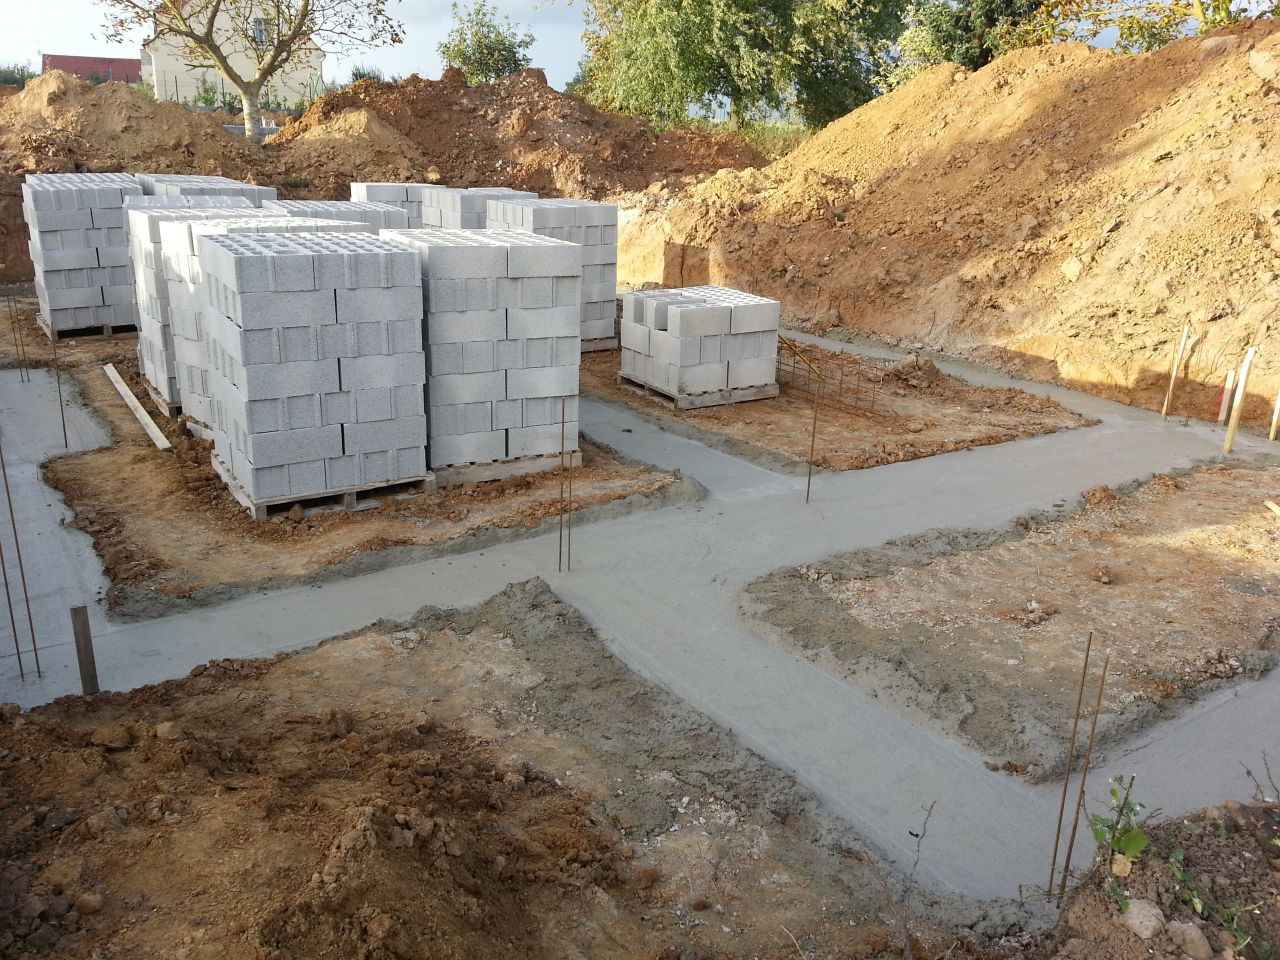 Choix du cr pi carrelage etc terrassement et fondations for Terrassement et fondation